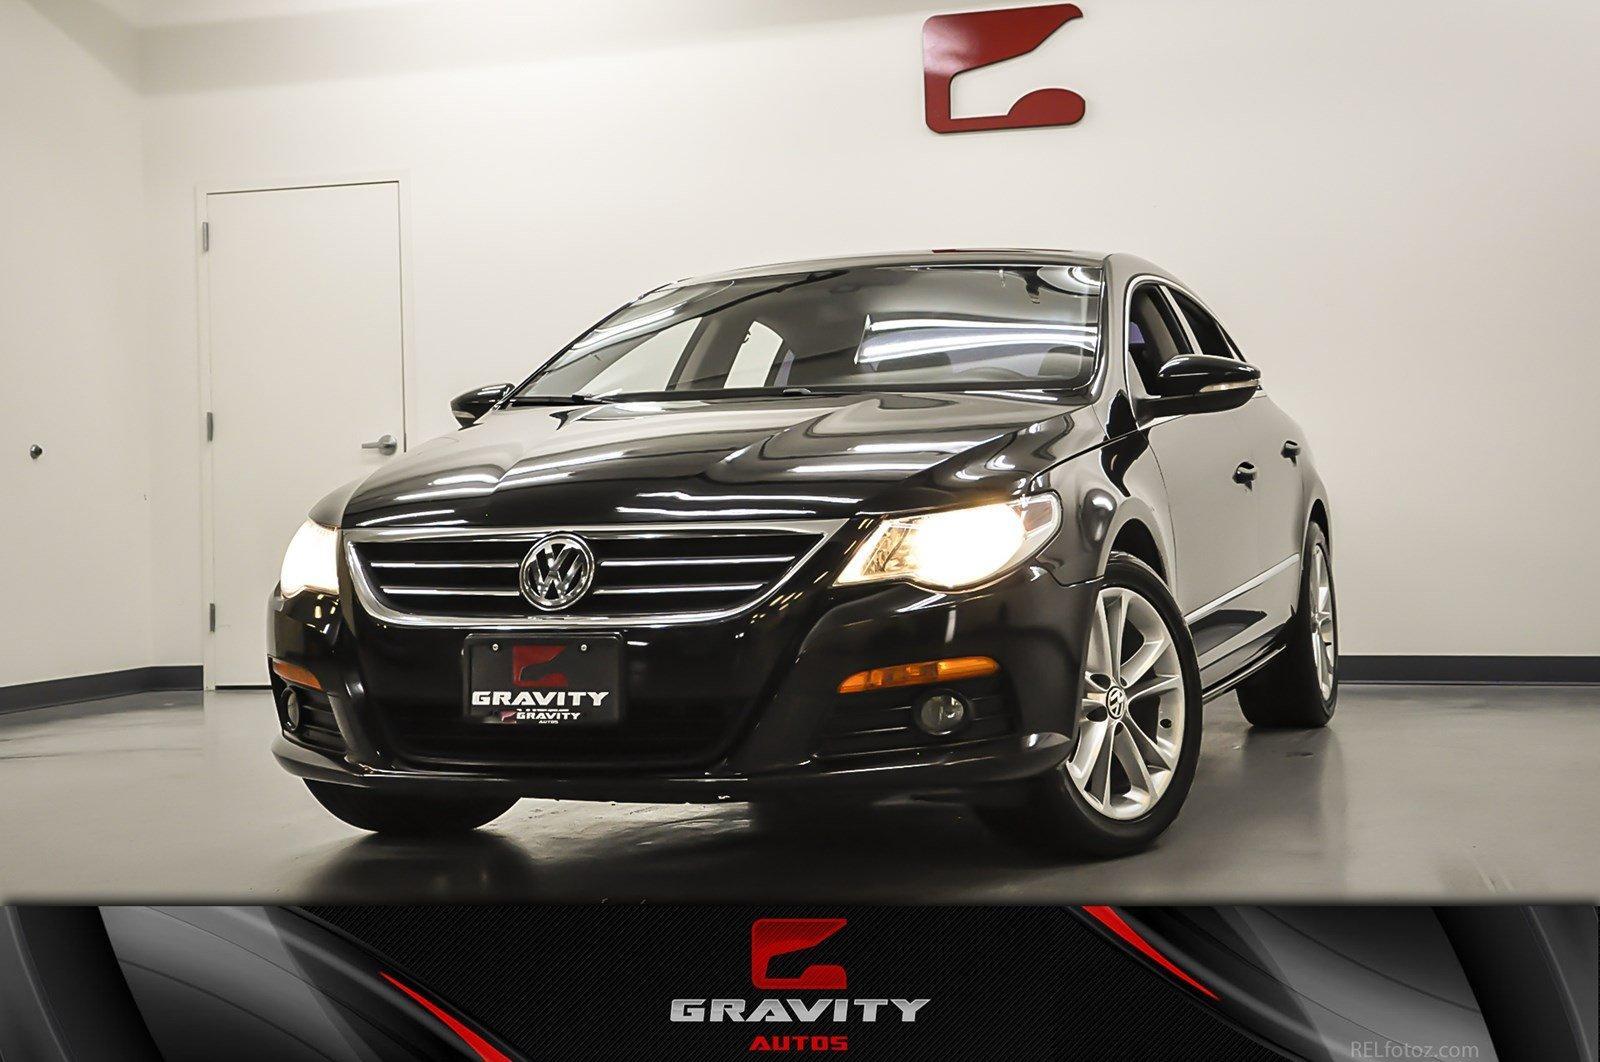 2010 Volkswagen Cc Luxury Stock 546868 For Sale Near